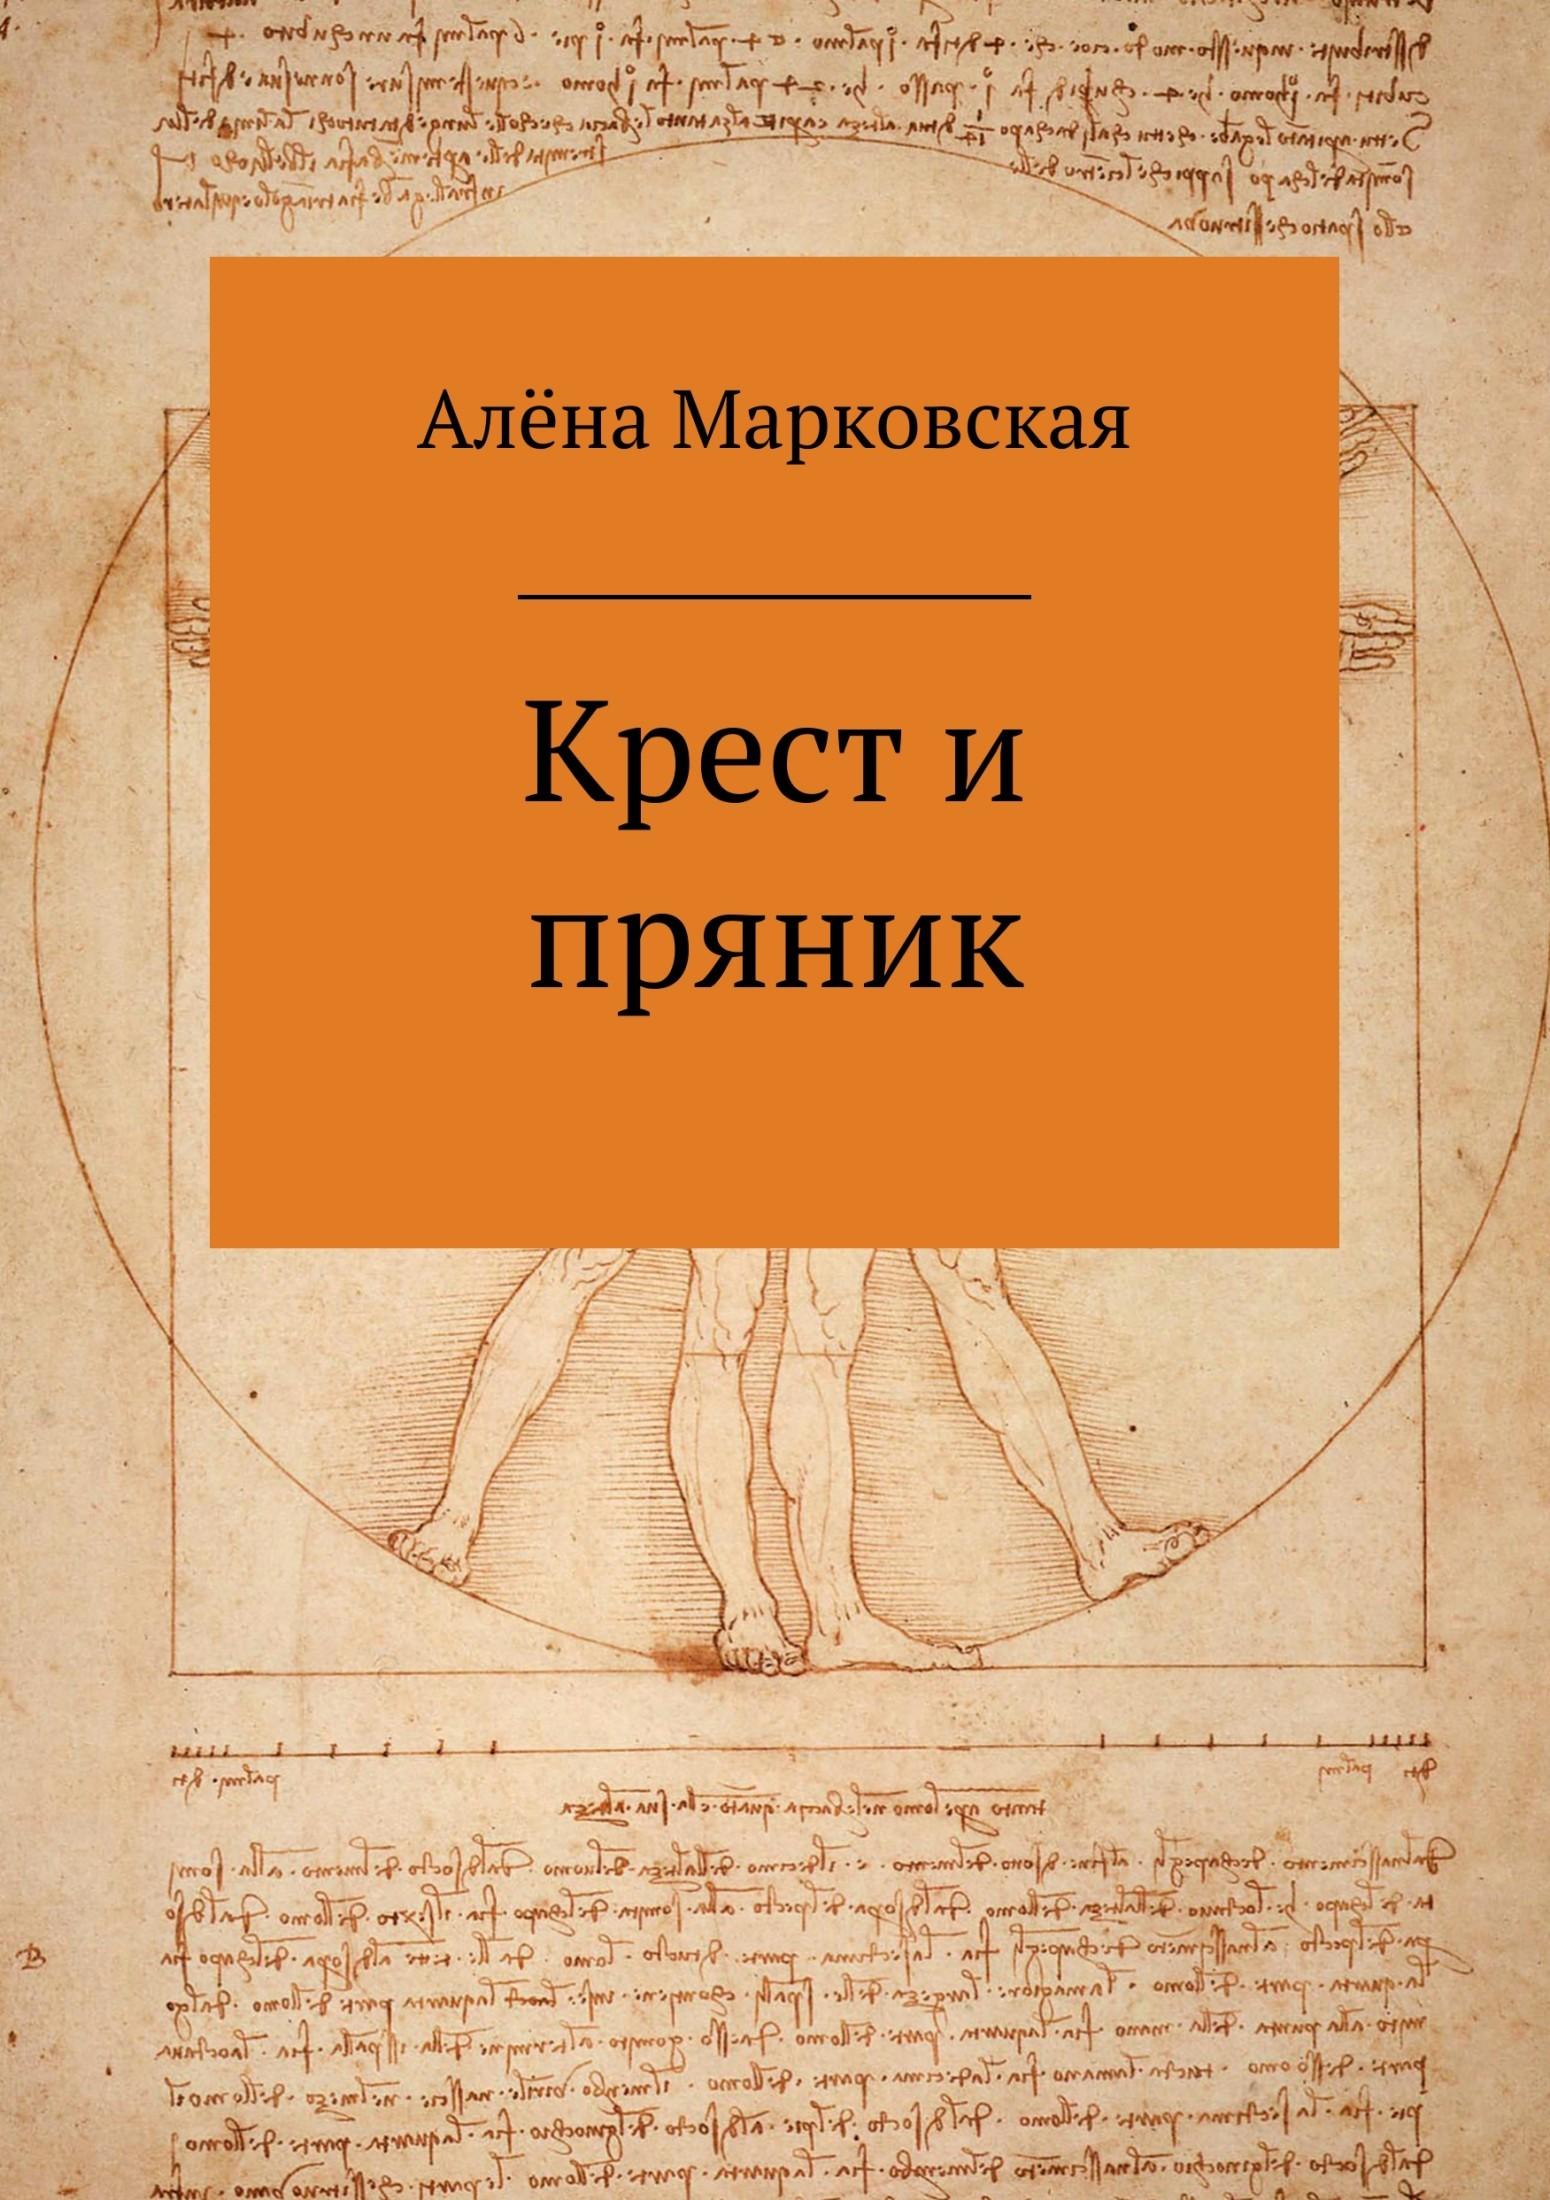 Алёна Юрьевна Марковская бесплатно